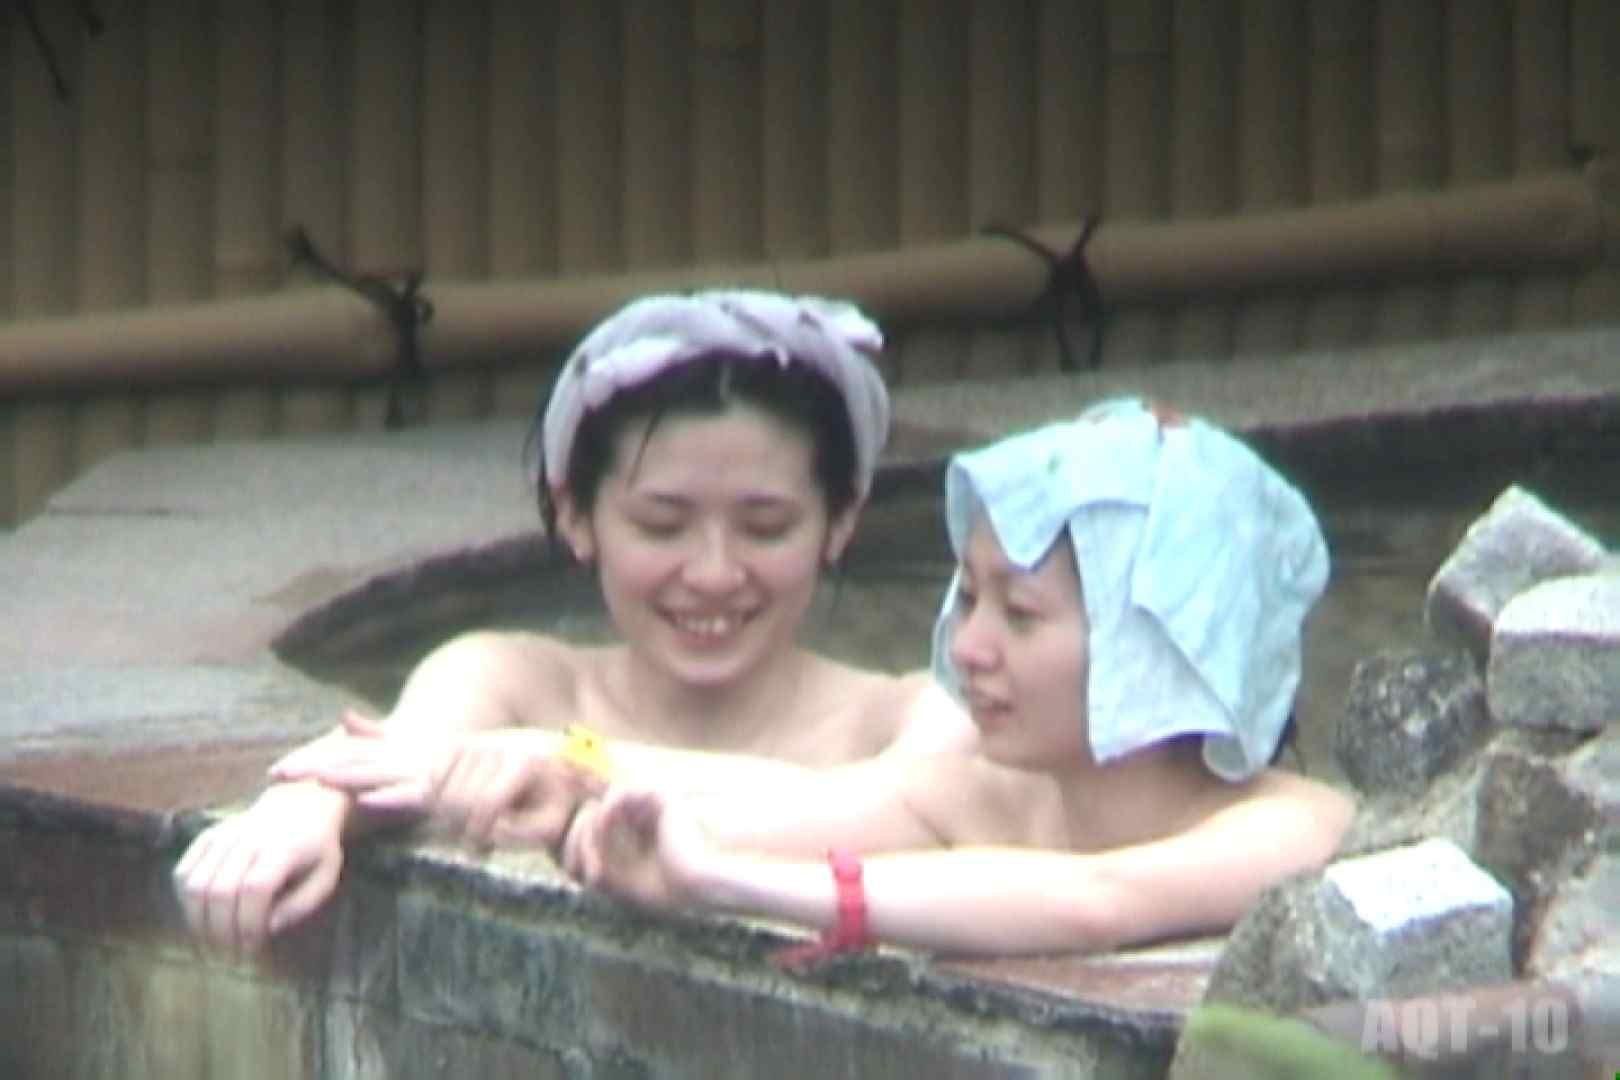 Aquaな露天風呂Vol.793 露天 | OLセックス  94画像 46